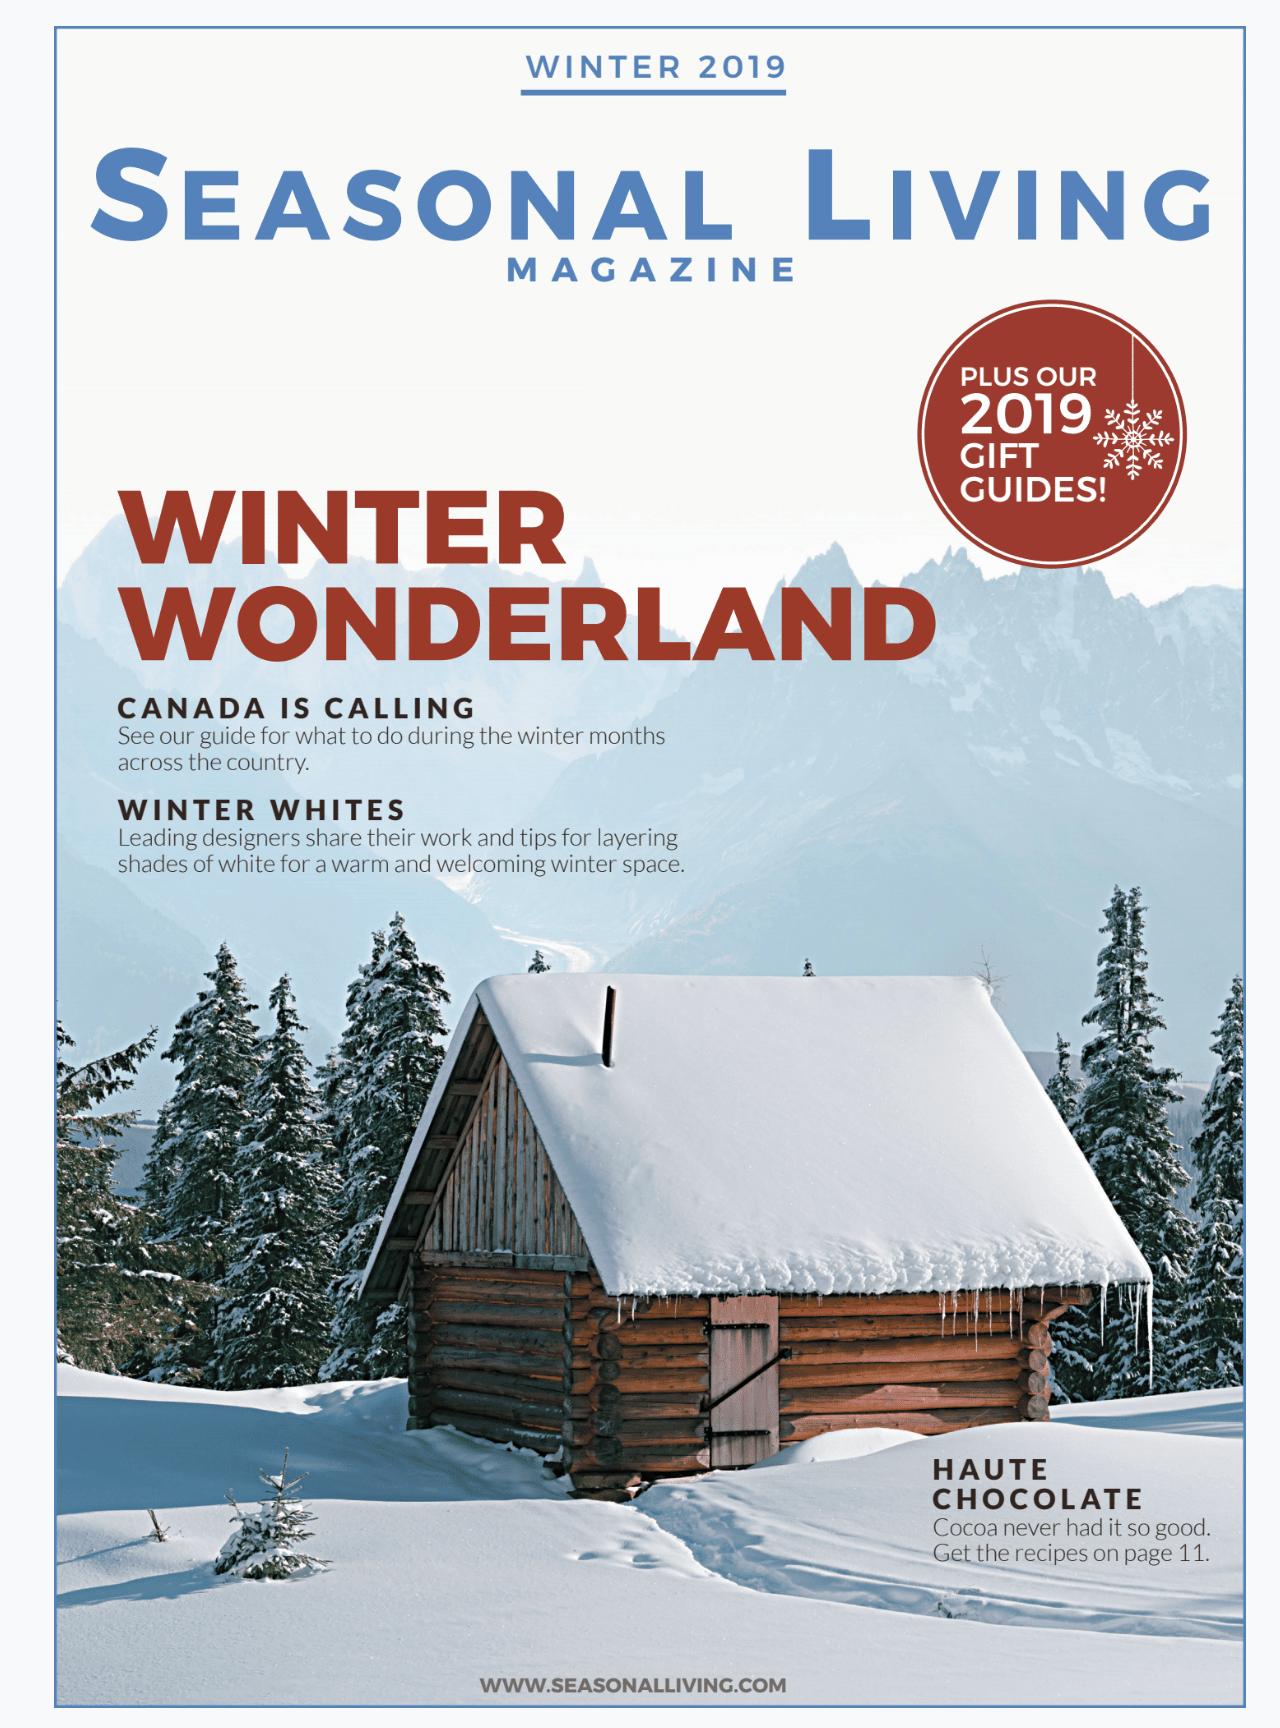 Seasonal Living Magazine Best New Digital Lifestyle Magazines